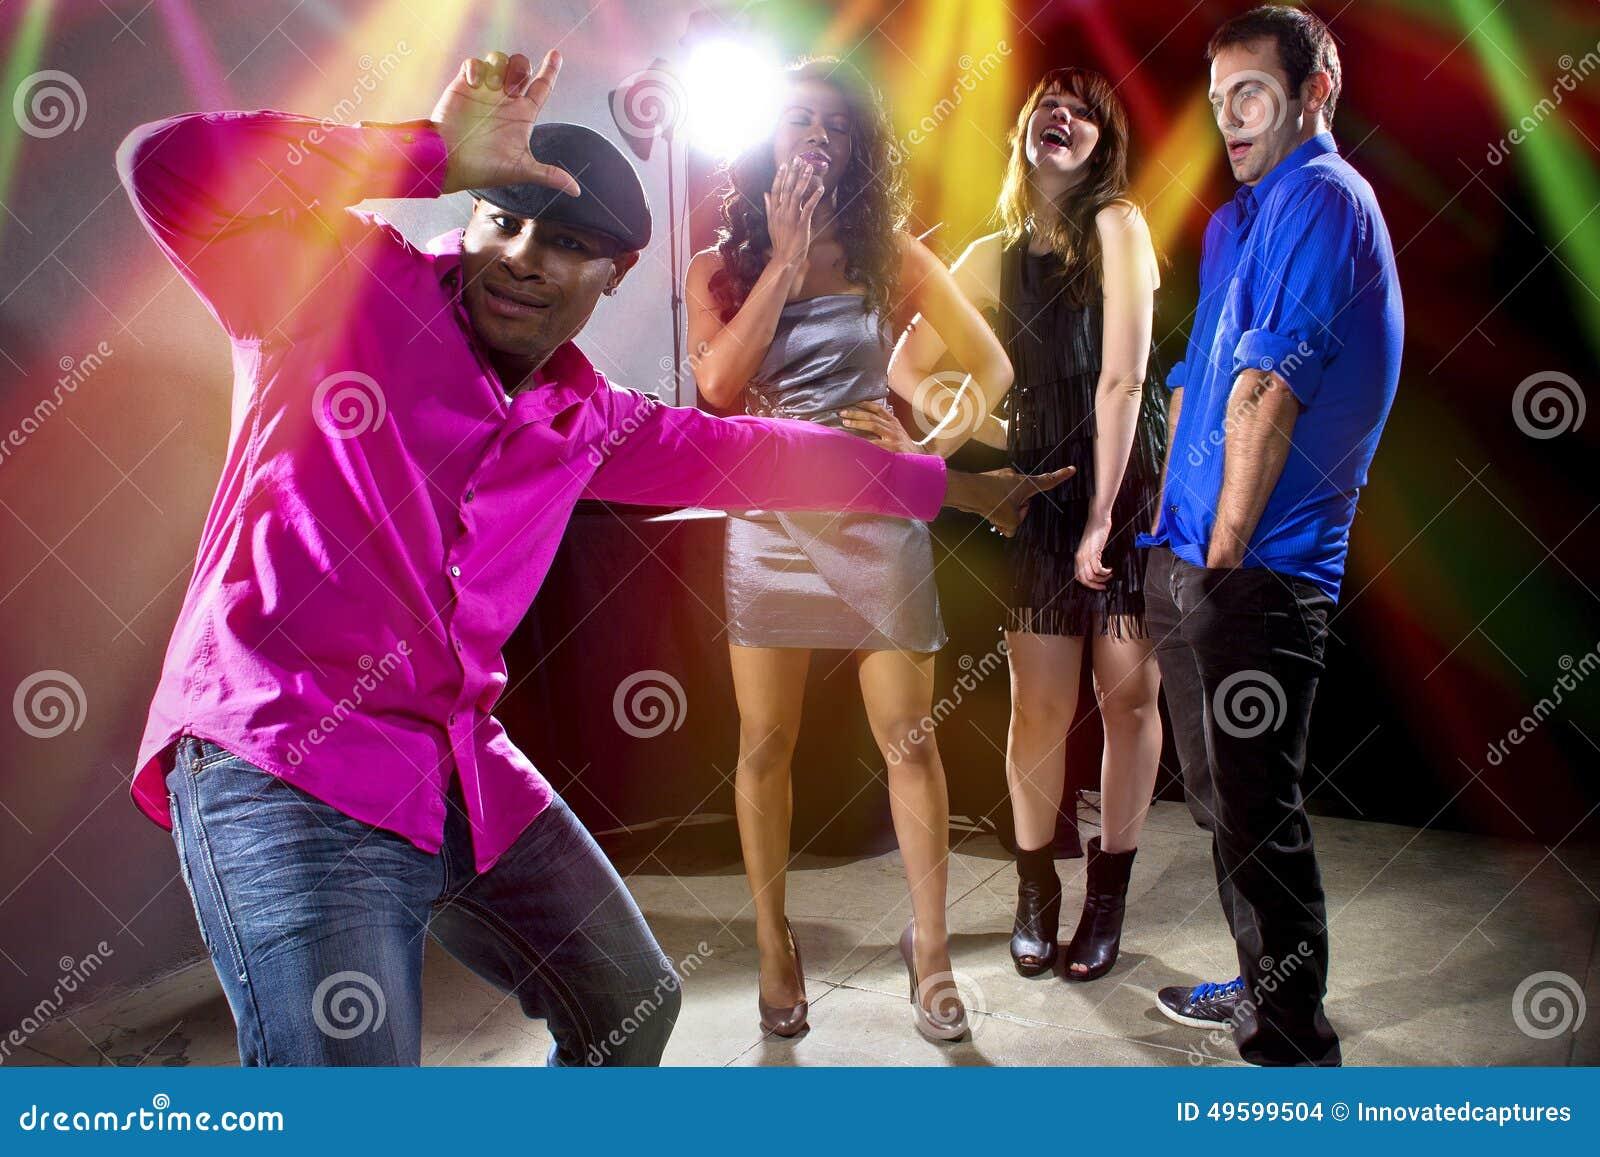 [Image: getting-rejected-girls-nightclub-laughin...599504.jpg]